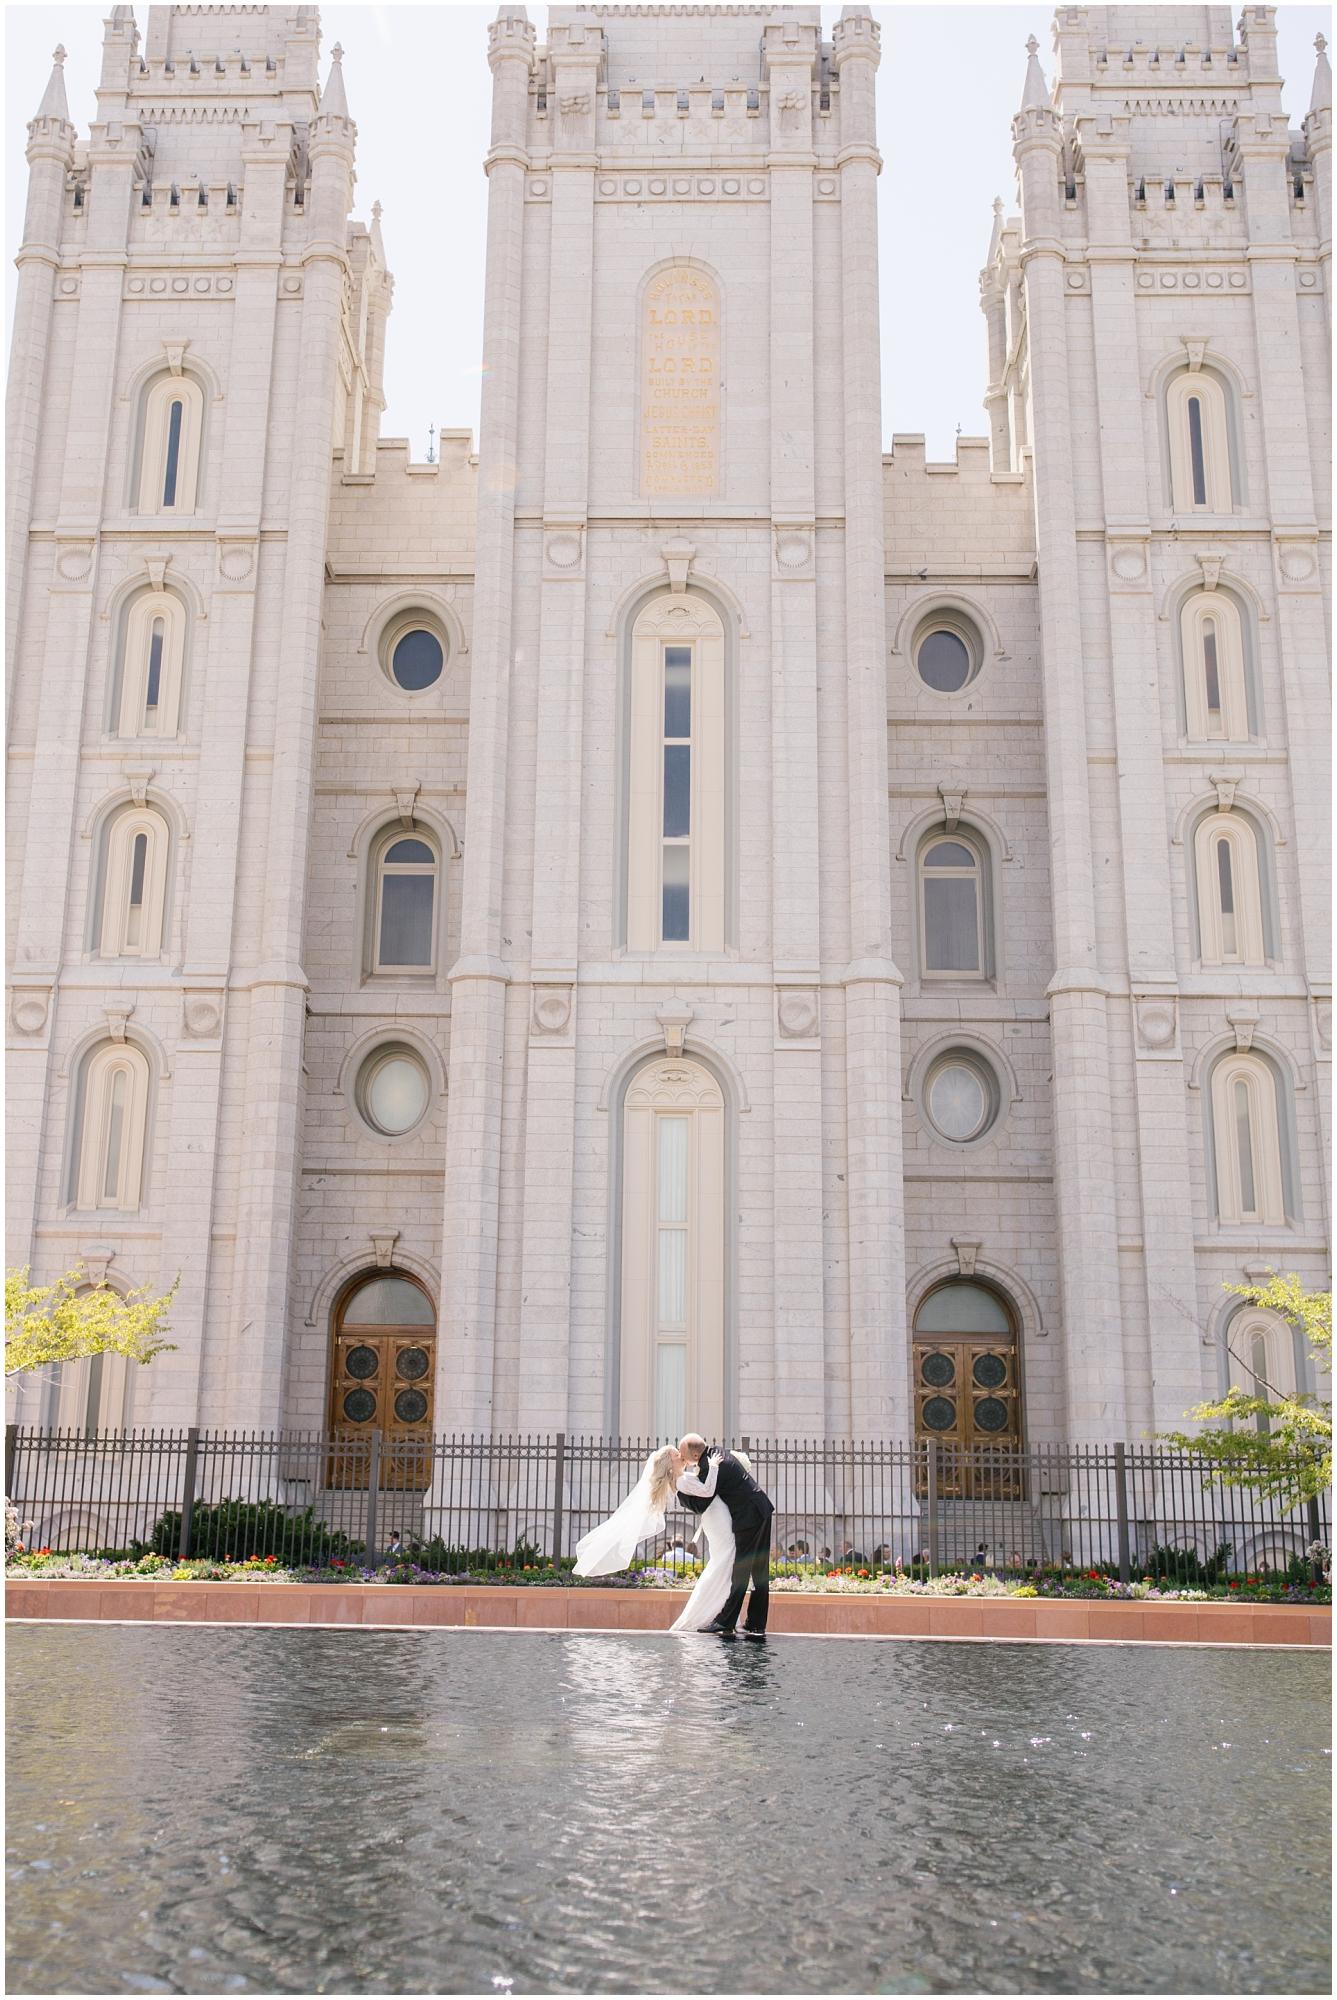 CherylandTyler-239_Lizzie-B-Imagery-Utah-Wedding-Photographer-Park-City-Salt-Lake-City-Temple-Wells-Fargo-Building.jpg